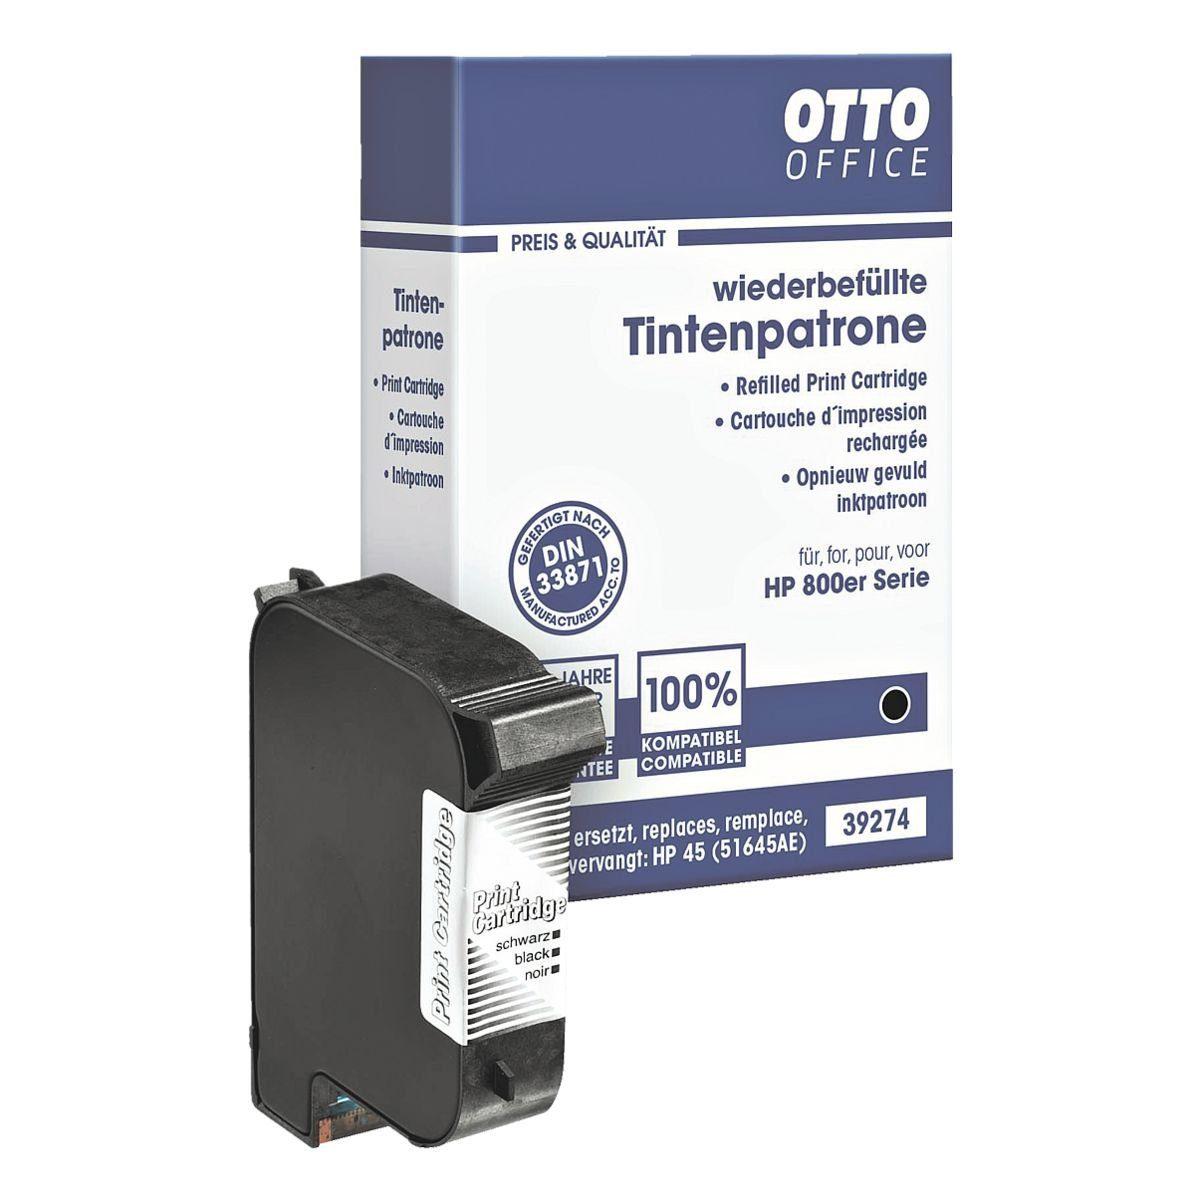 OTTO Office Tintenpatrone ersetzt HP »51645AE« Nr. 45